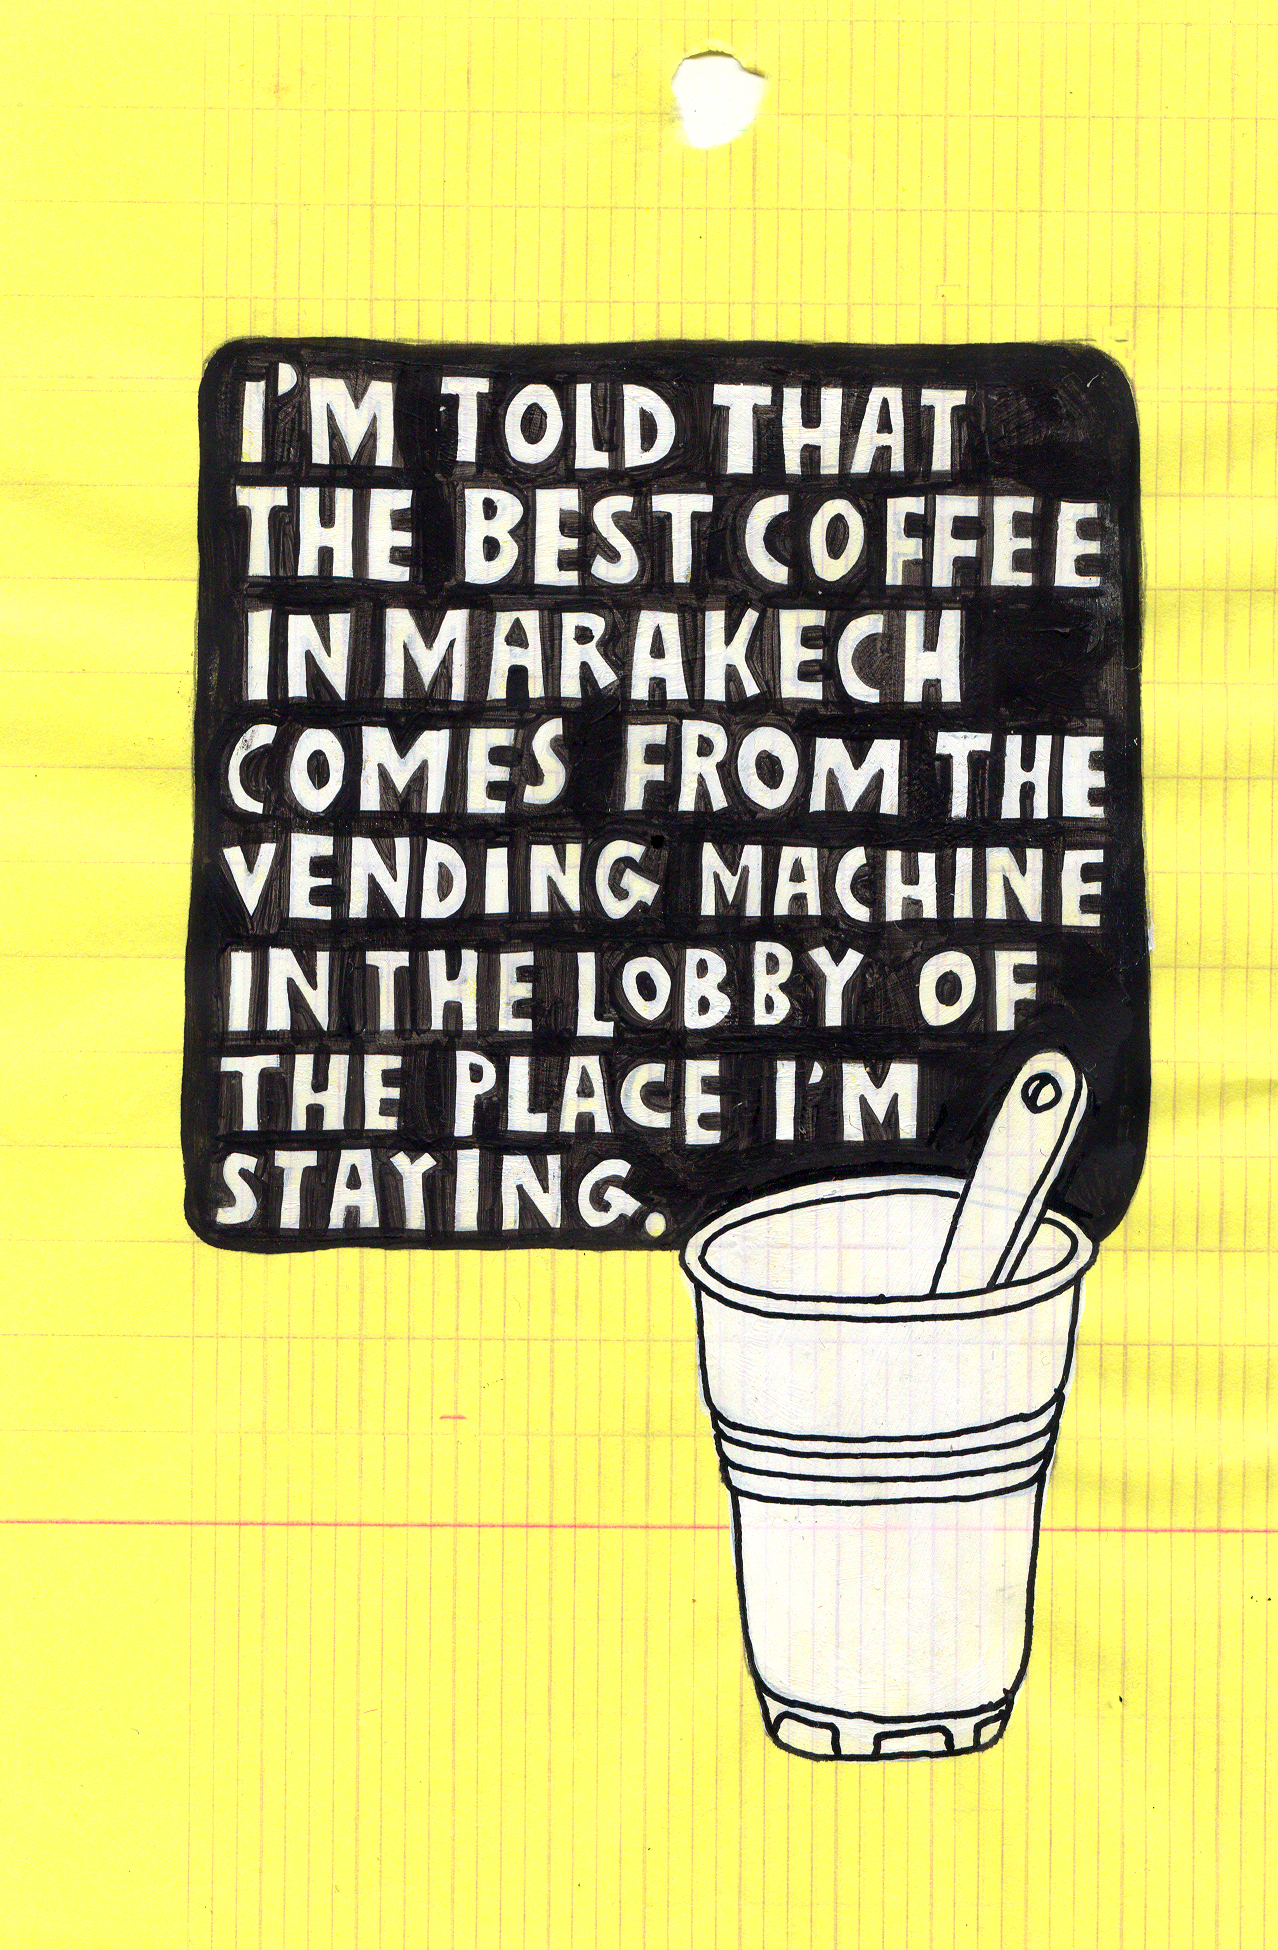 MOROC Best Coffee.jpg